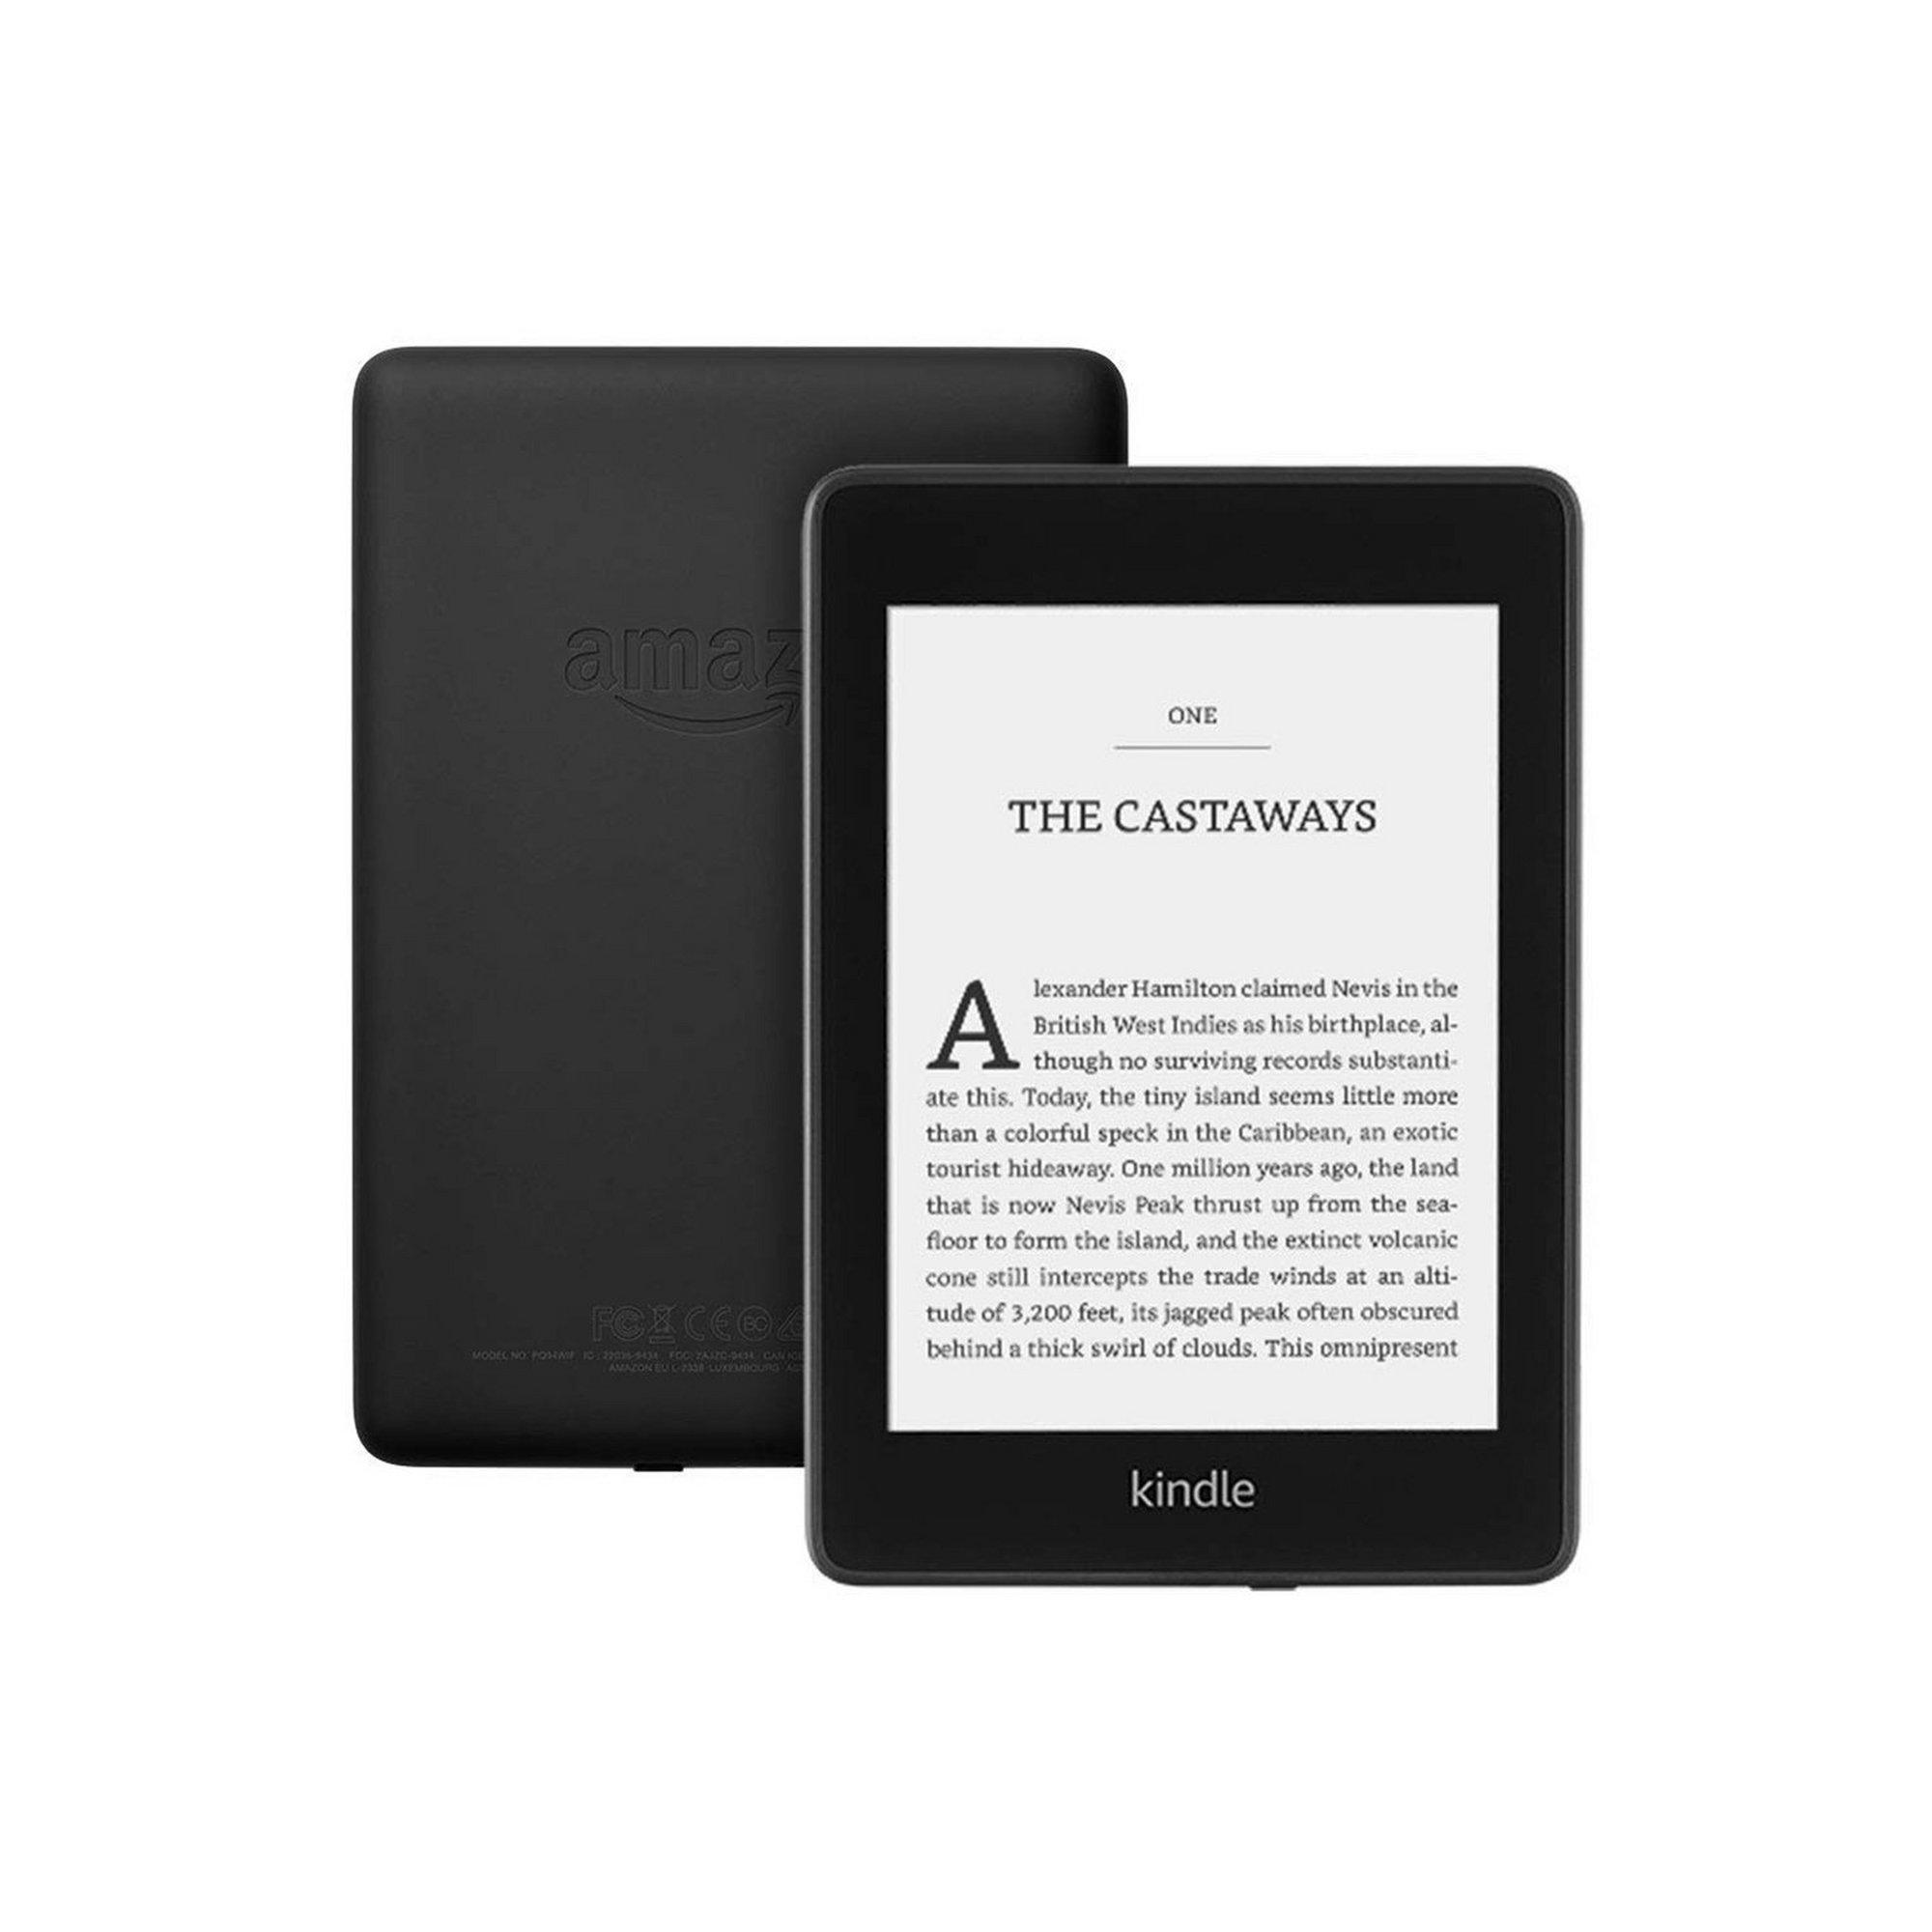 Image of Amazon Kindle Paperwhite 8GB E-Reader 2018 - Black Case Bundle